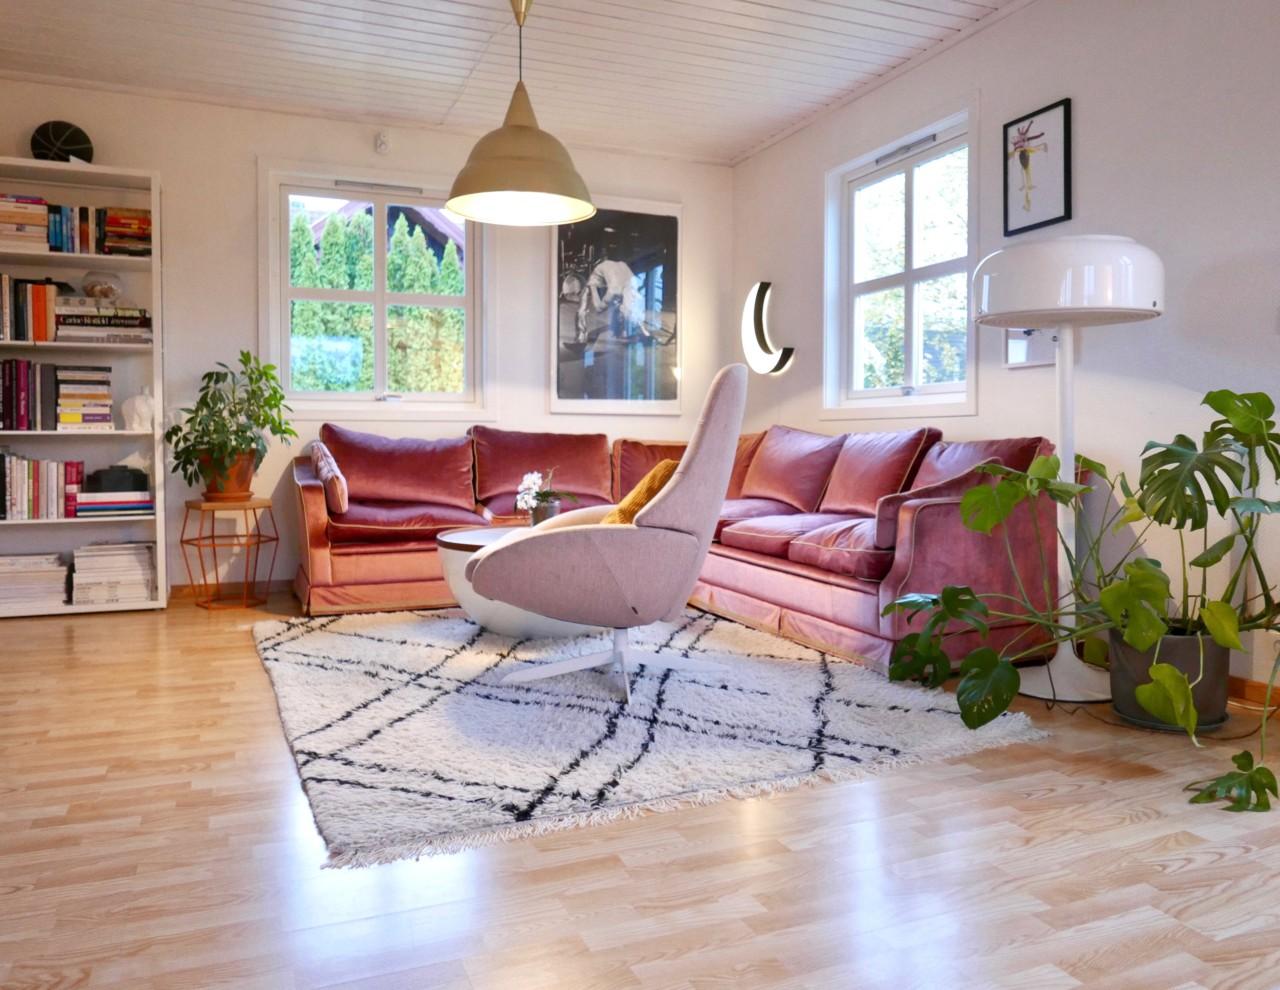 green-house-living-room-freska